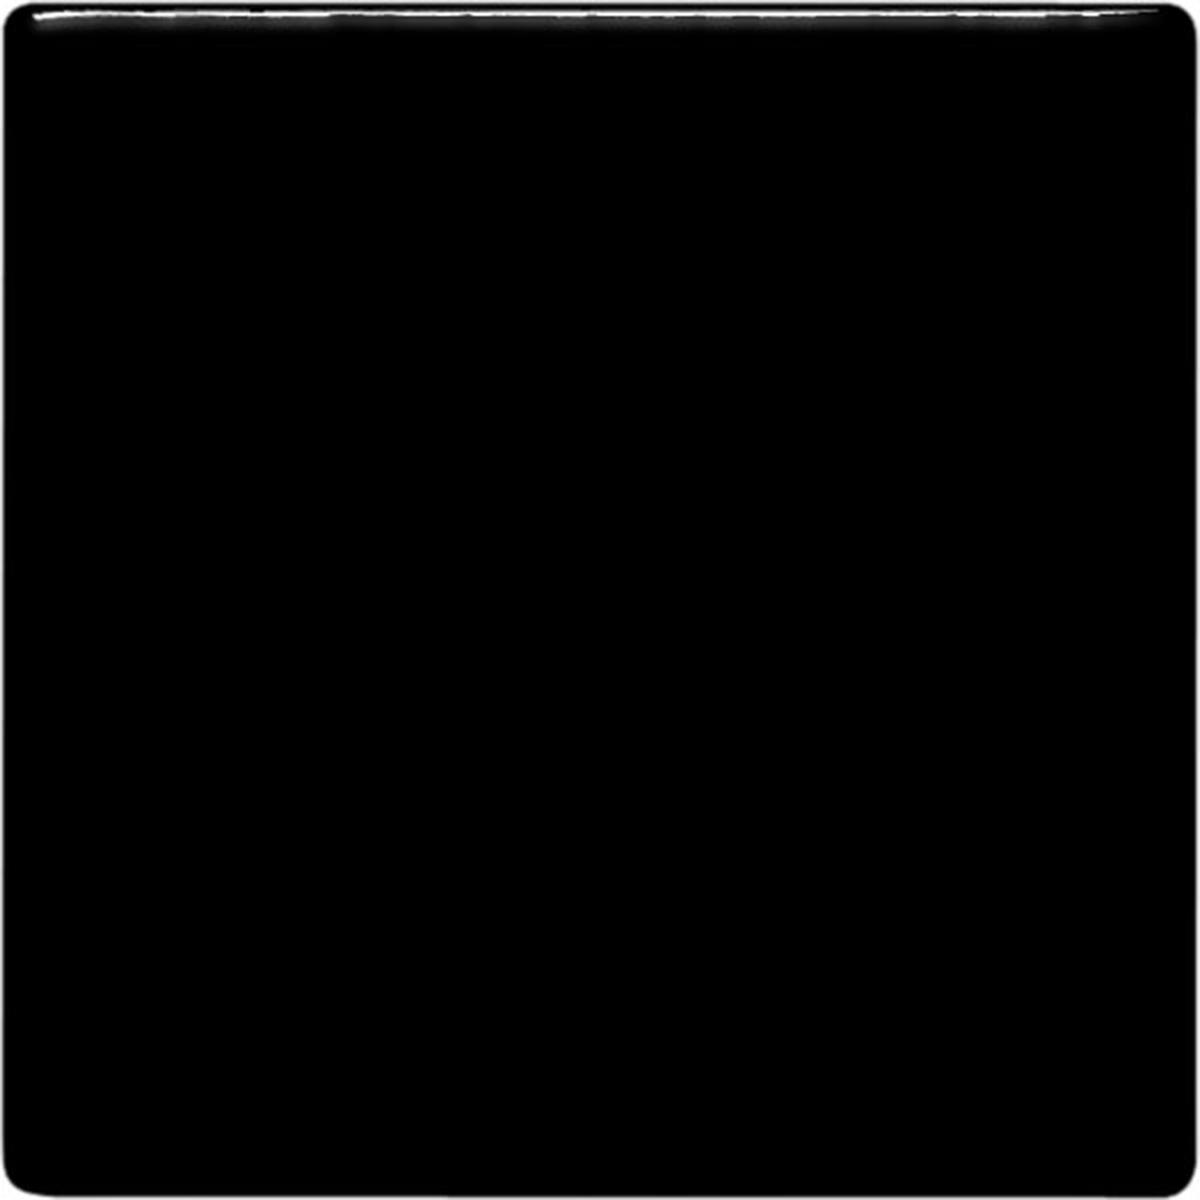 venta de esmalte para cerámica amaco teachers palette Tp-1 coal black baja temperatura